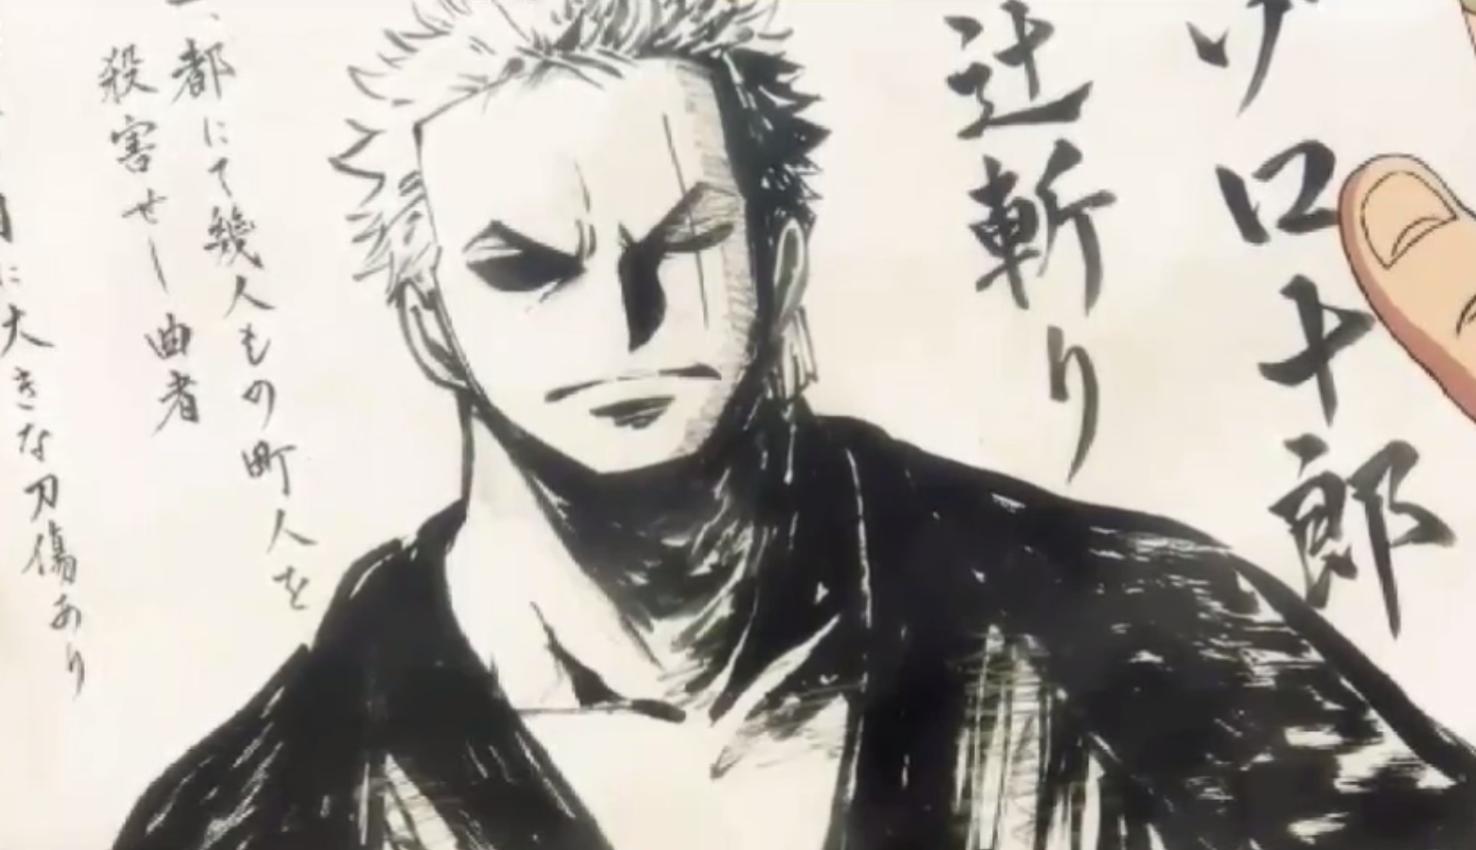 Dia pernah mencoba membunuh orochi, namun berhasil ditahan oleh kyoshiro alias denjiro. Zoro Bounty Wallpapers Top Free Zoro Bounty Backgrounds Wallpaperaccess